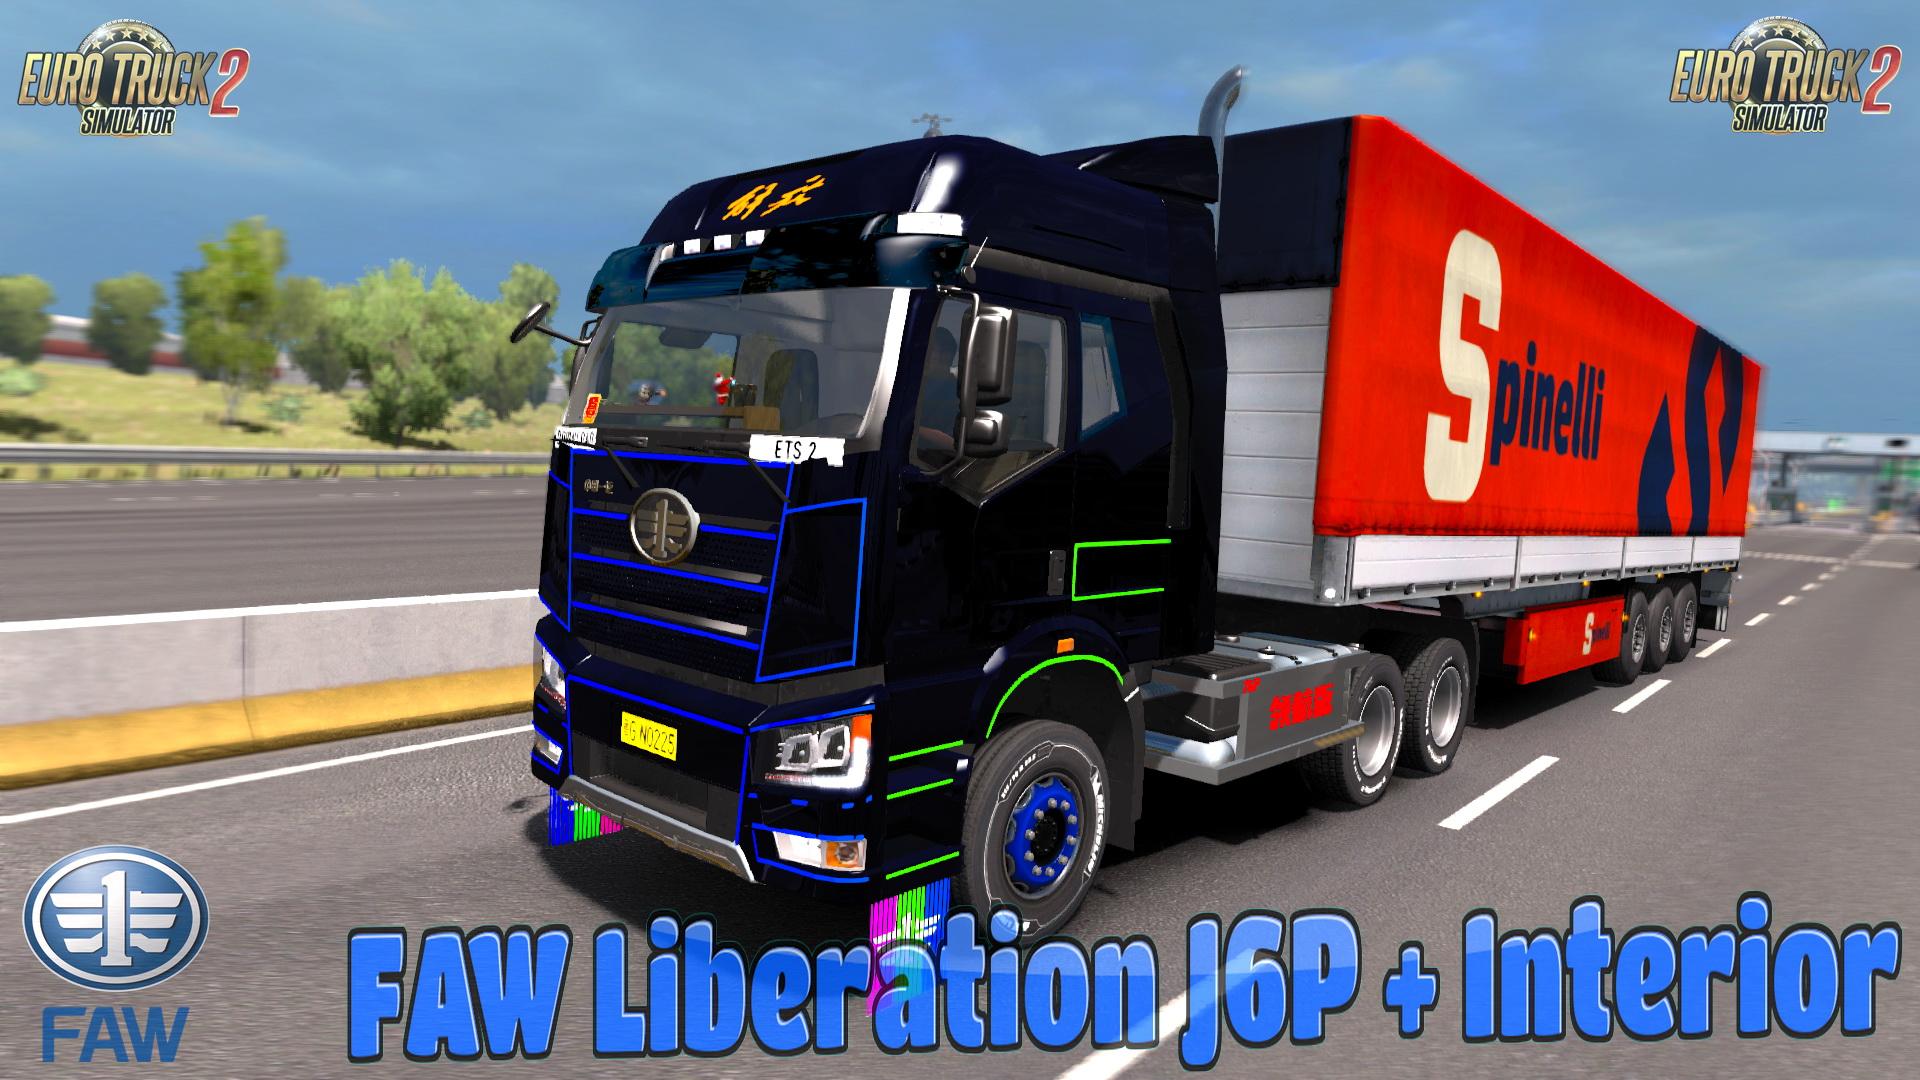 FAW Liberation J6P + Interior v1.0 (1.30.x)